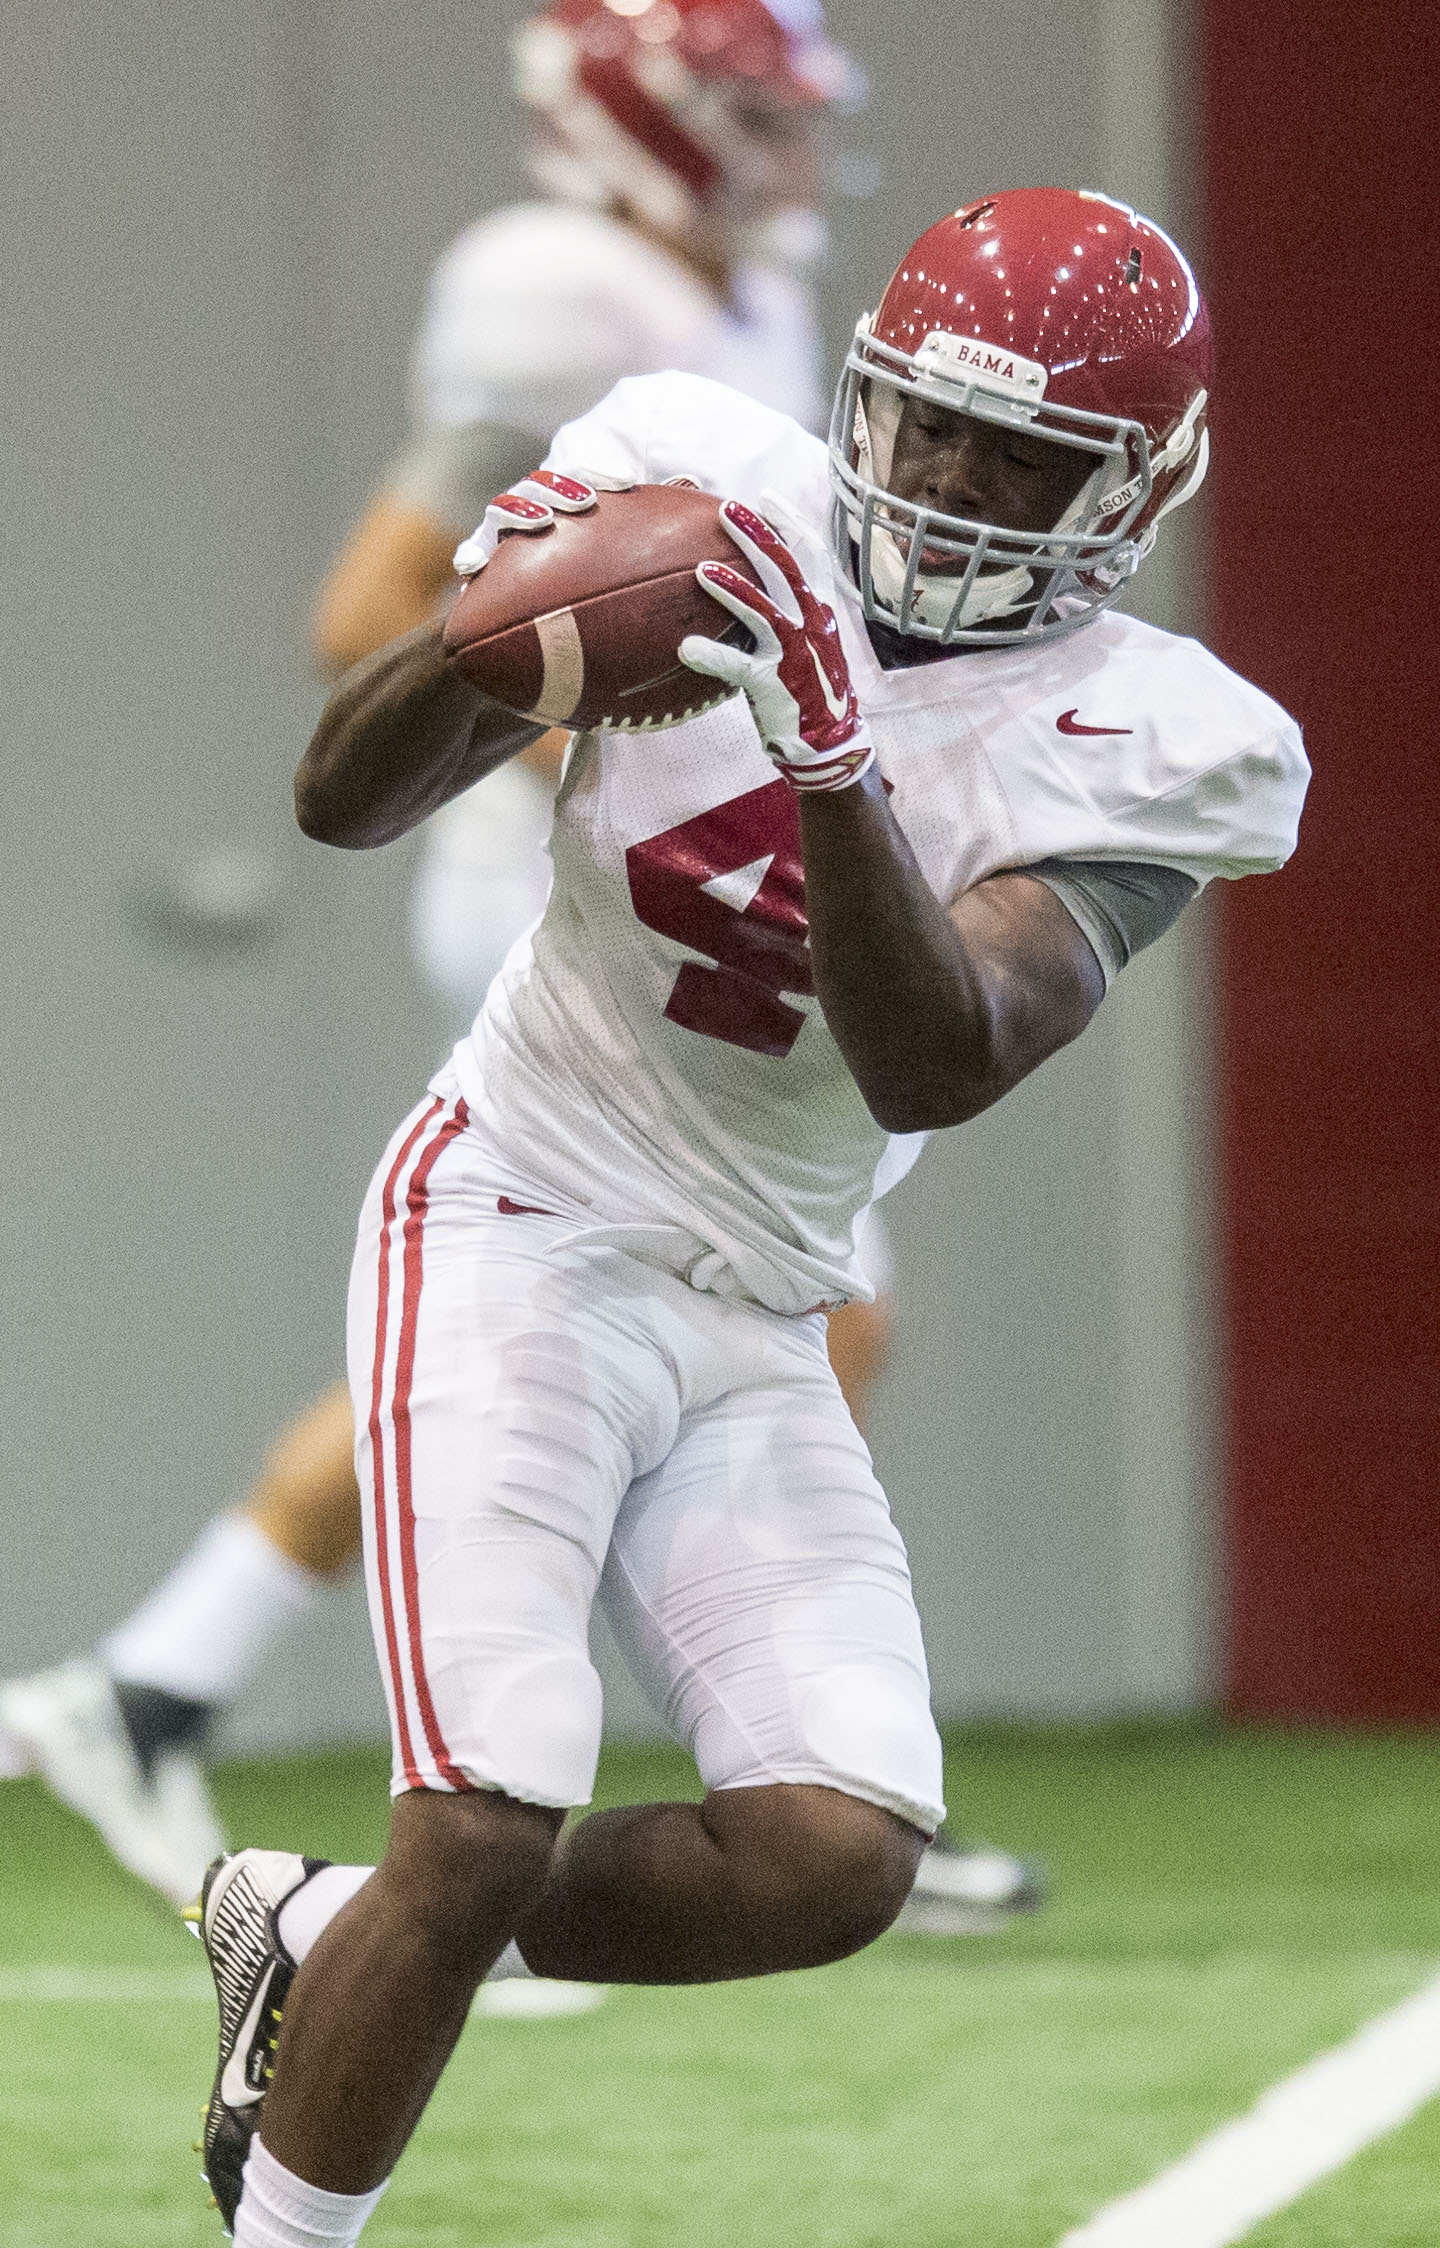 Alabama wide receiver Daylon Charlot catches the ball during NCAA college football practice Tuesday, Aug. 18, 2015, in Tuscaloosa, Ala. (Vasha Hunt/AL.com via AP)